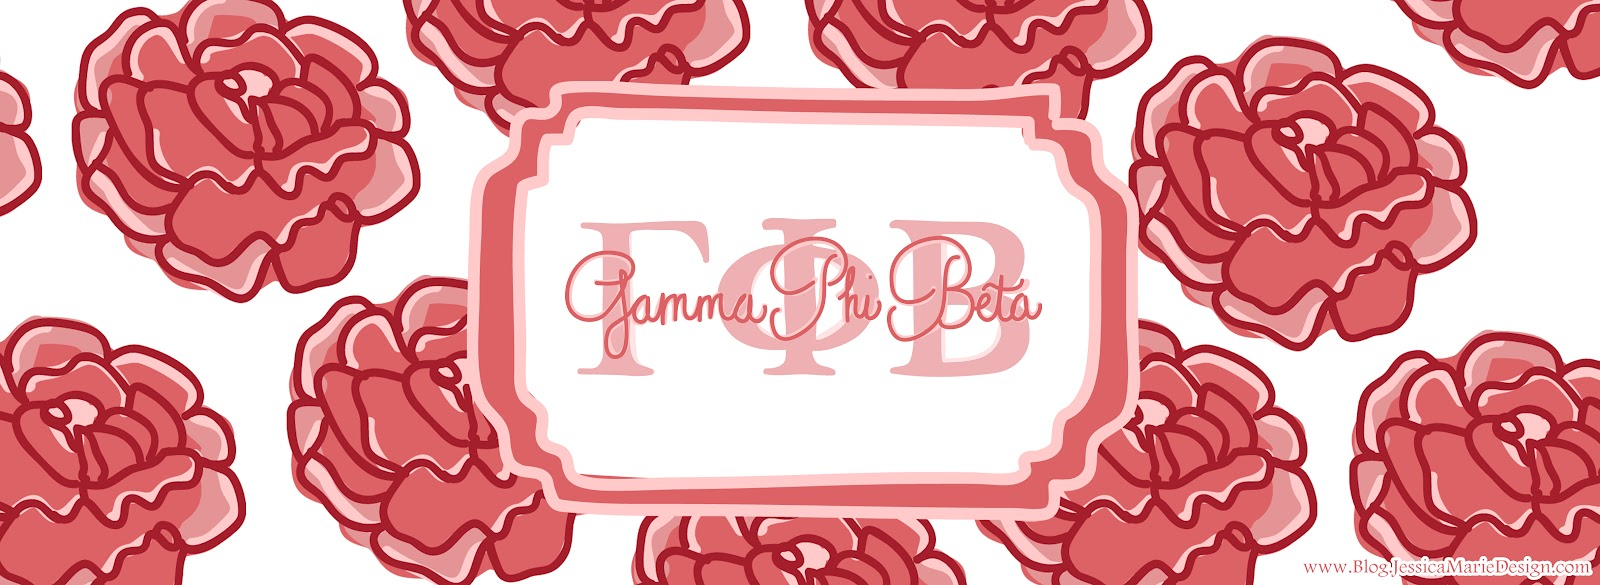 Gamma phi beta clipart jpg free 78 Best images about Gamma Phi Beta <3 on Pinterest | Sorority ... jpg free